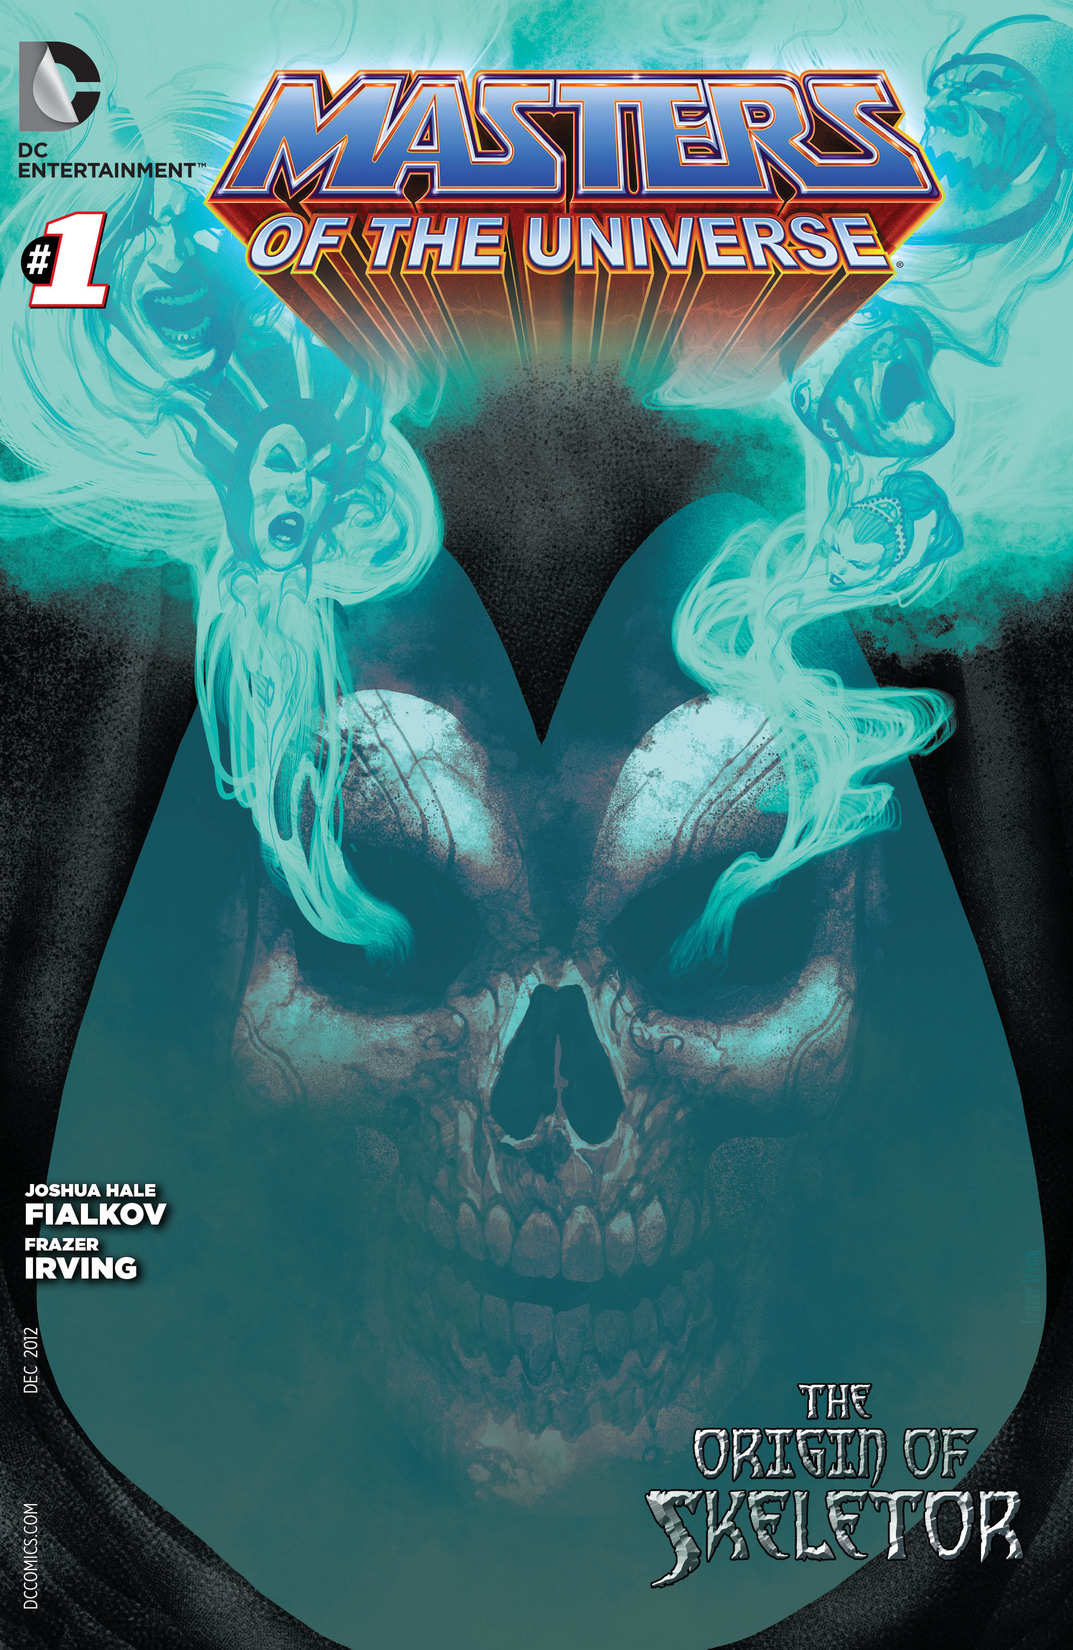 He-man Org  U0026gt  Publishing  U0026gt  Comics  U0026gt  Dc Comics